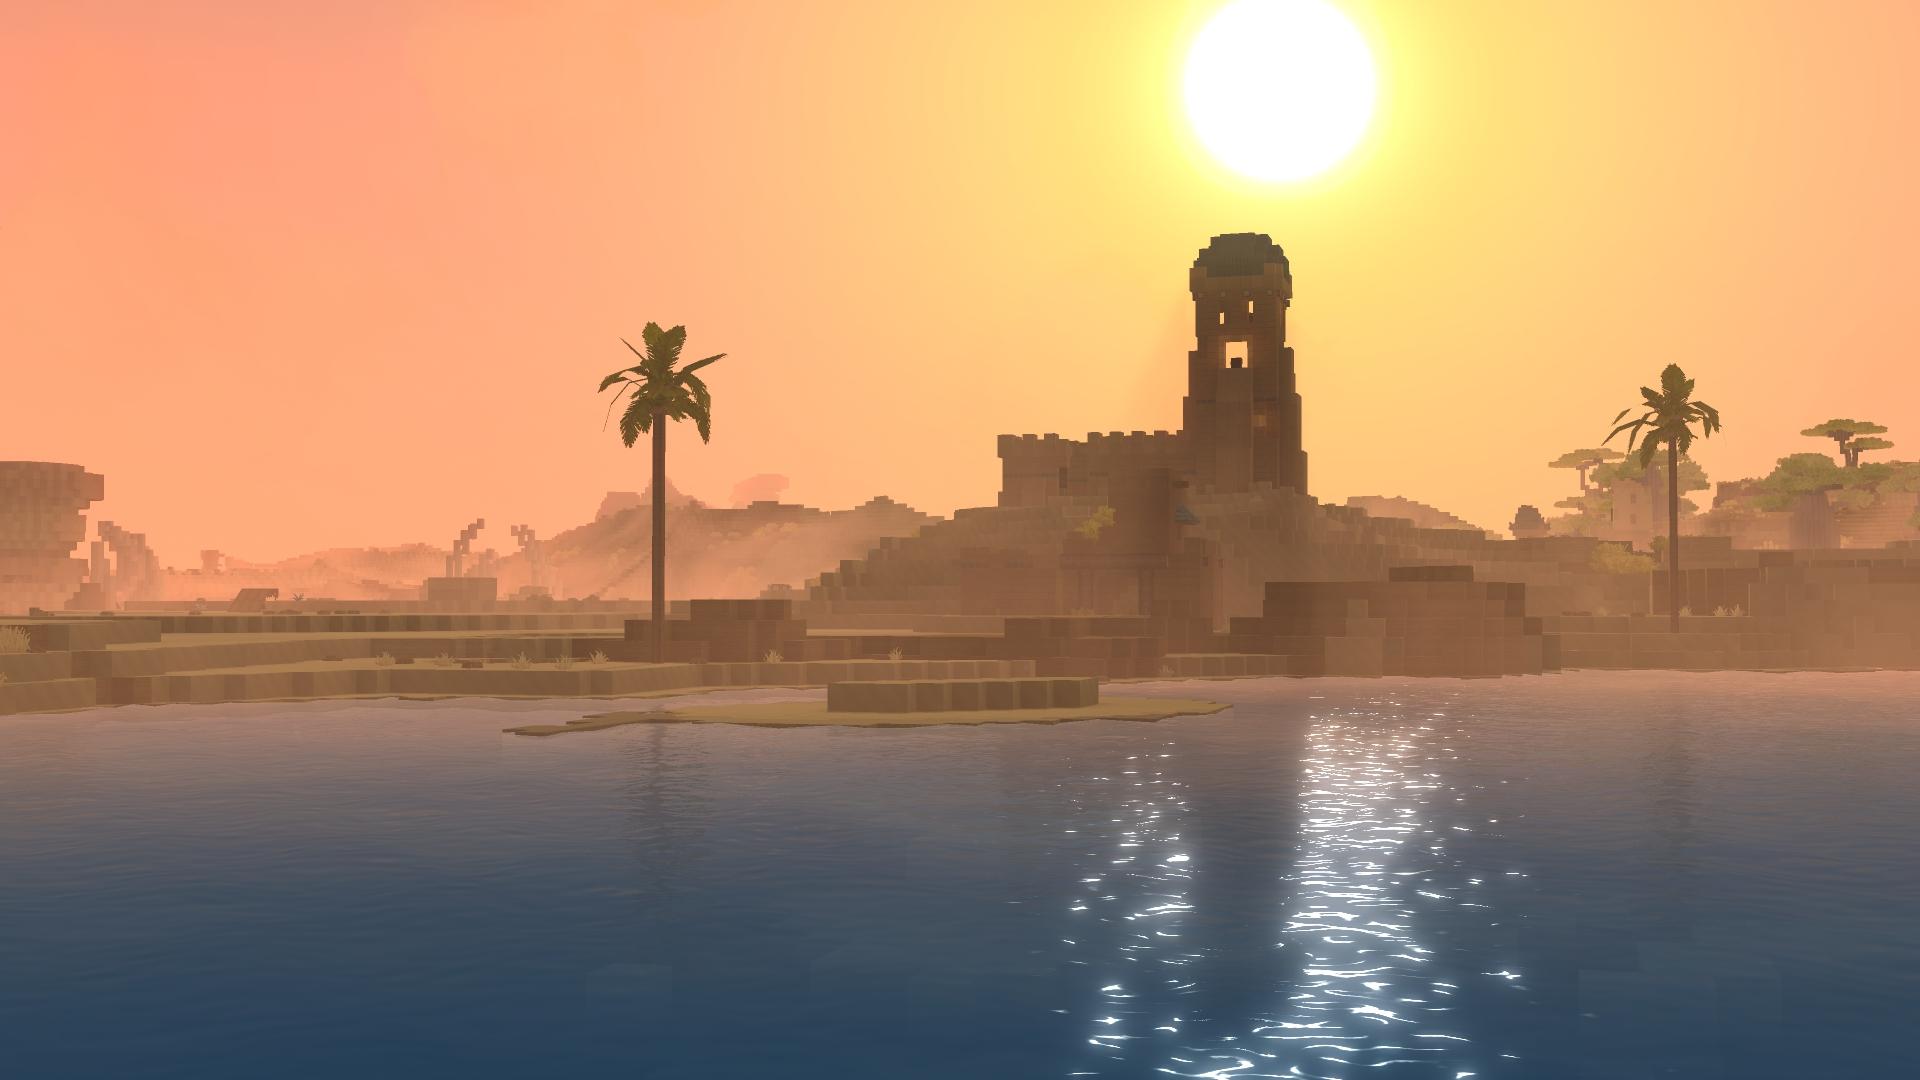 55b10c971a293d28980bf84f9c1eb82b_desert_sunrise.jpg